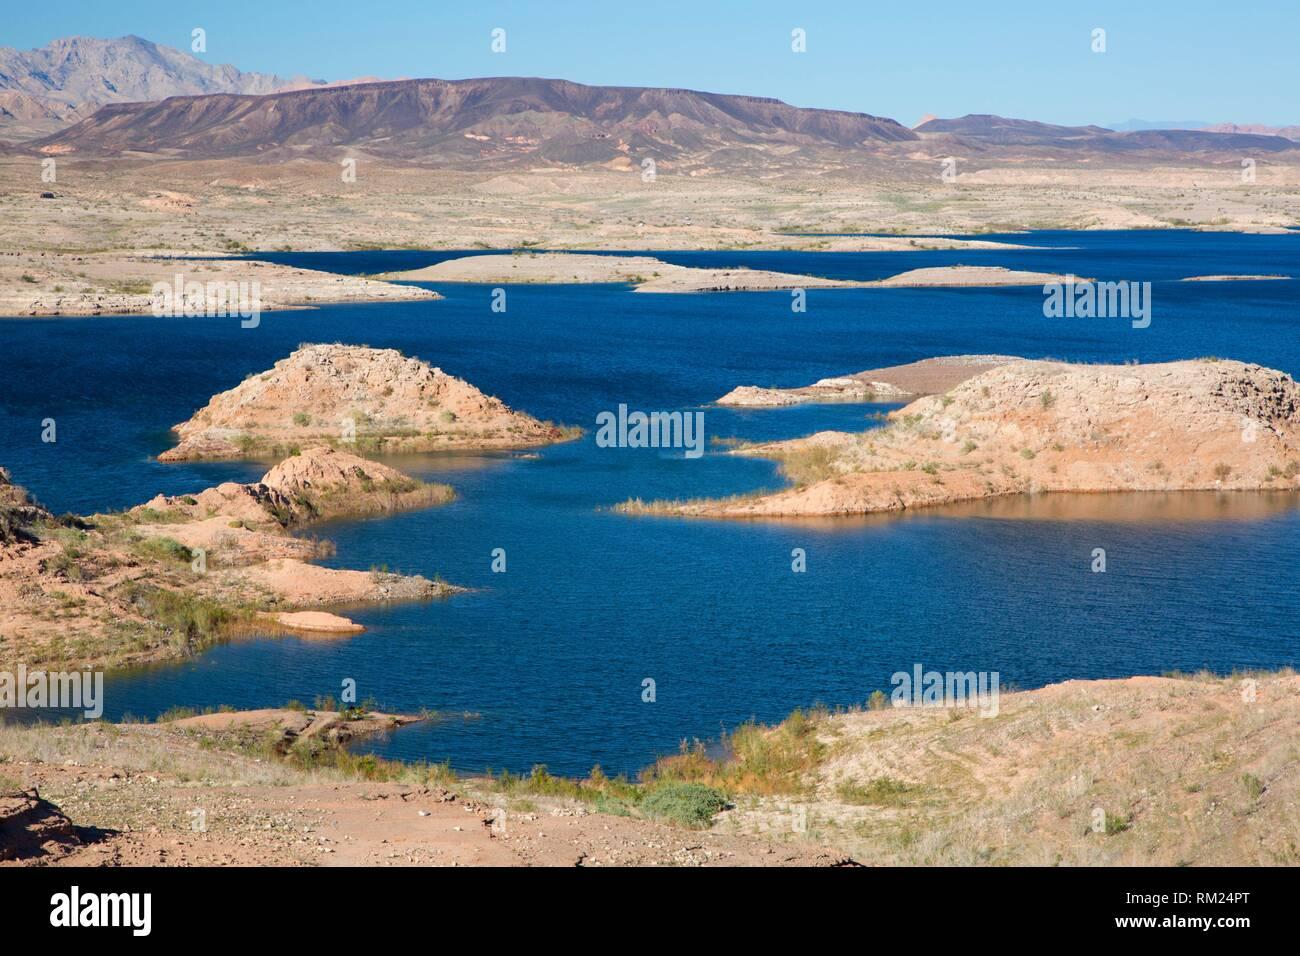 Lake Mead, Lake Mead National Recreation Area, Nevada. Stock Photo